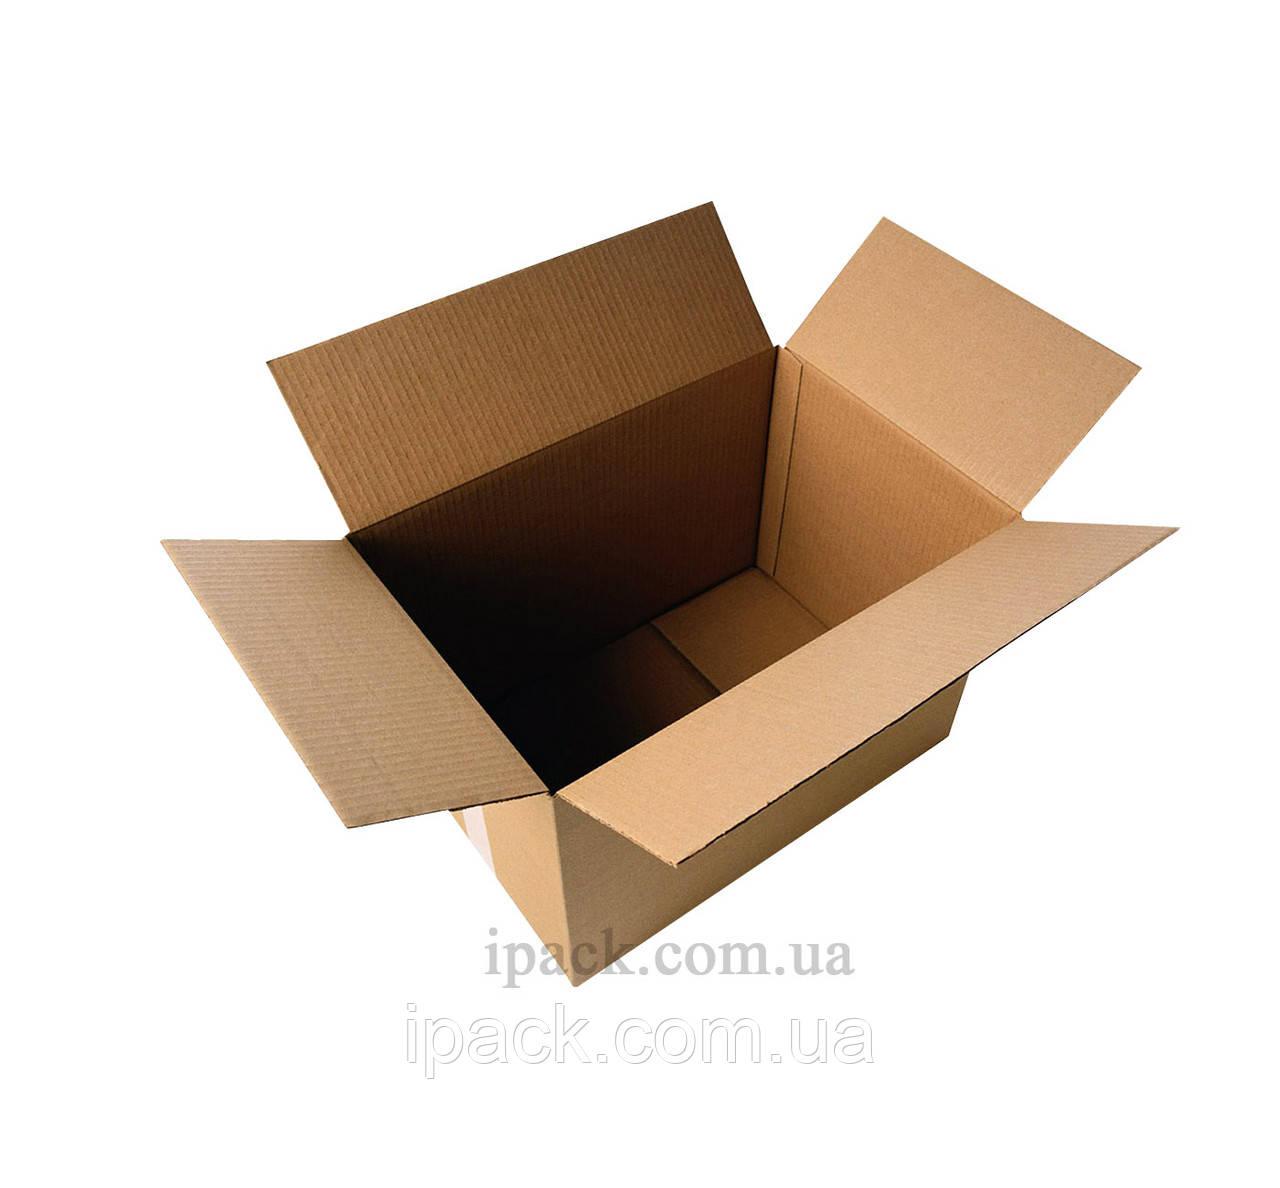 Гофроящик 330*280*240 мм, бурый, четырехклапанный картонный короб